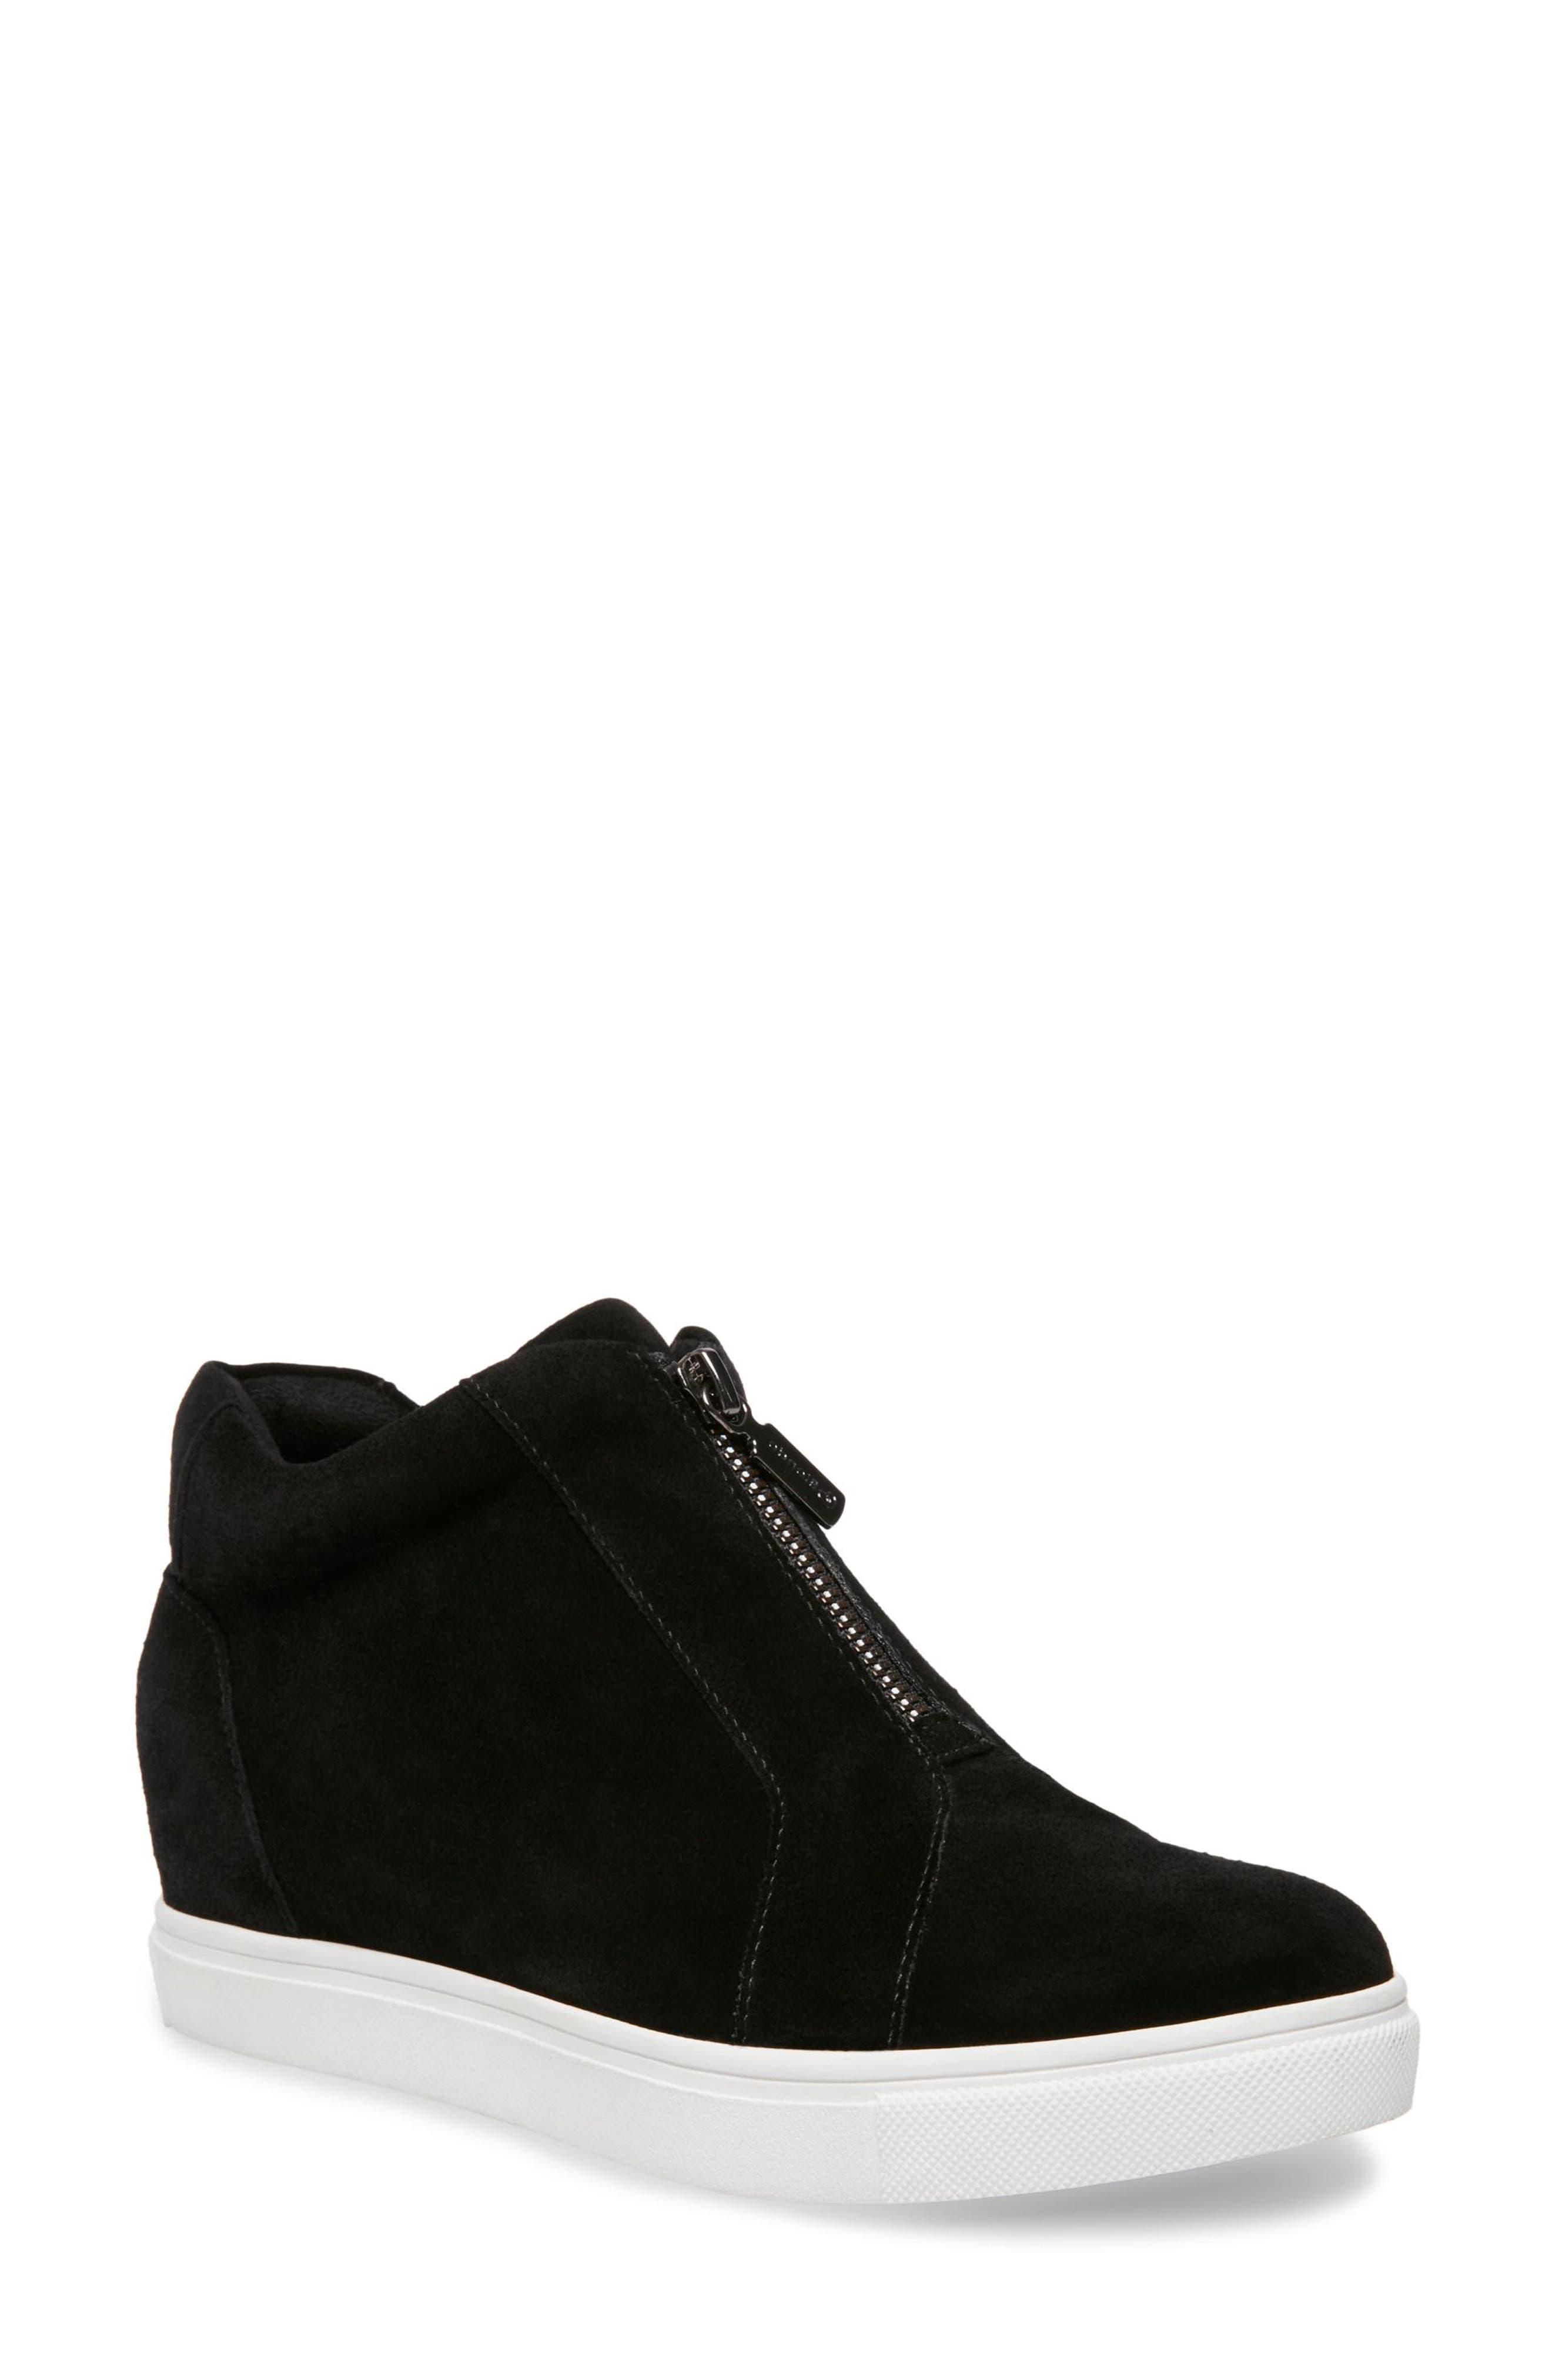 BLONDO Glenda Waterproof Sneaker Bootie, Main, color, BLACK SUEDE